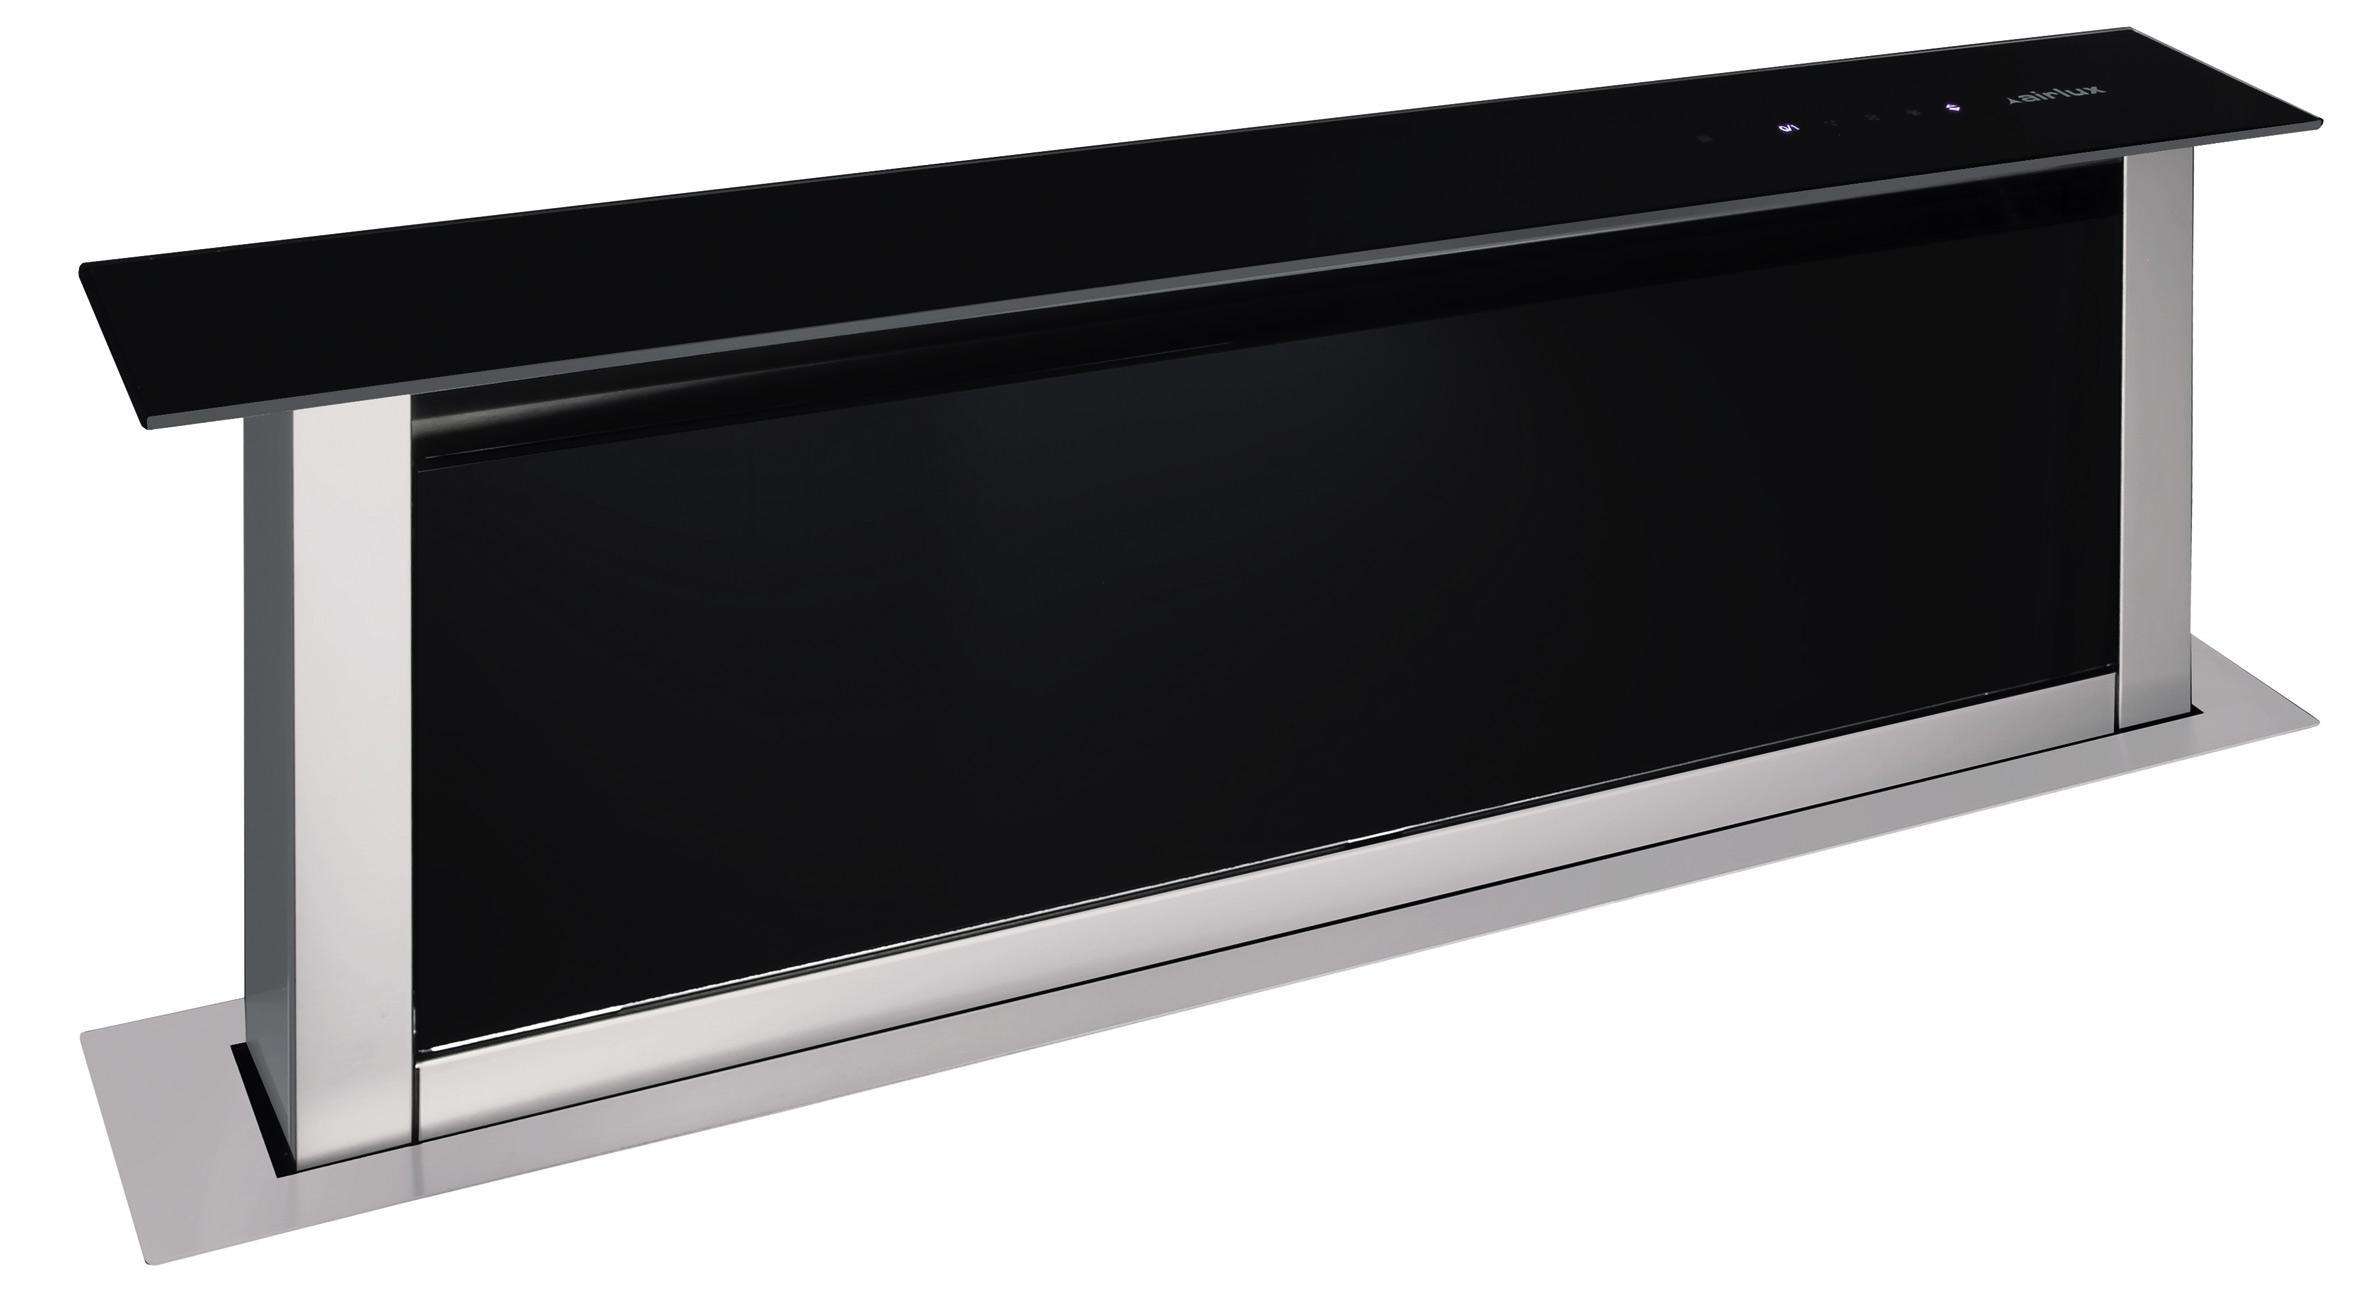 hotte airlux ahv98bk pas cher. Black Bedroom Furniture Sets. Home Design Ideas